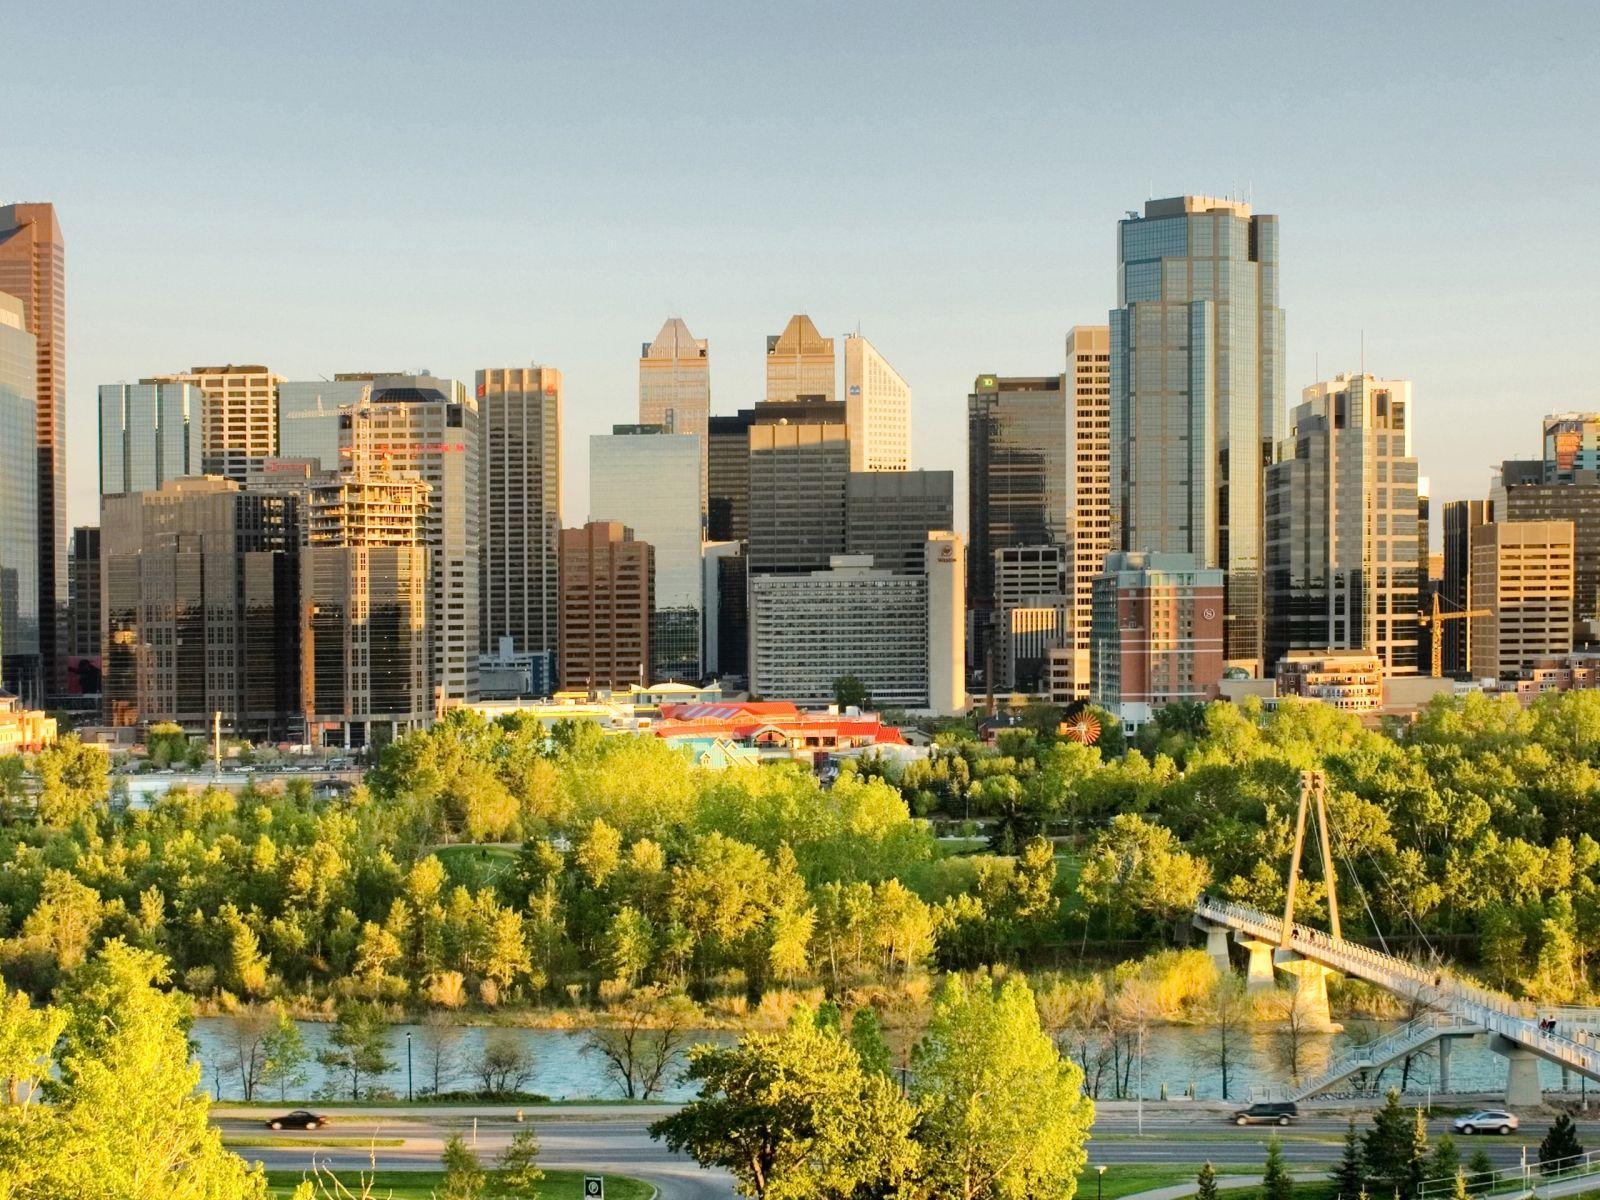 City Calgary Canada desktop wallpaper nr 57851 by Striker 1600x1200